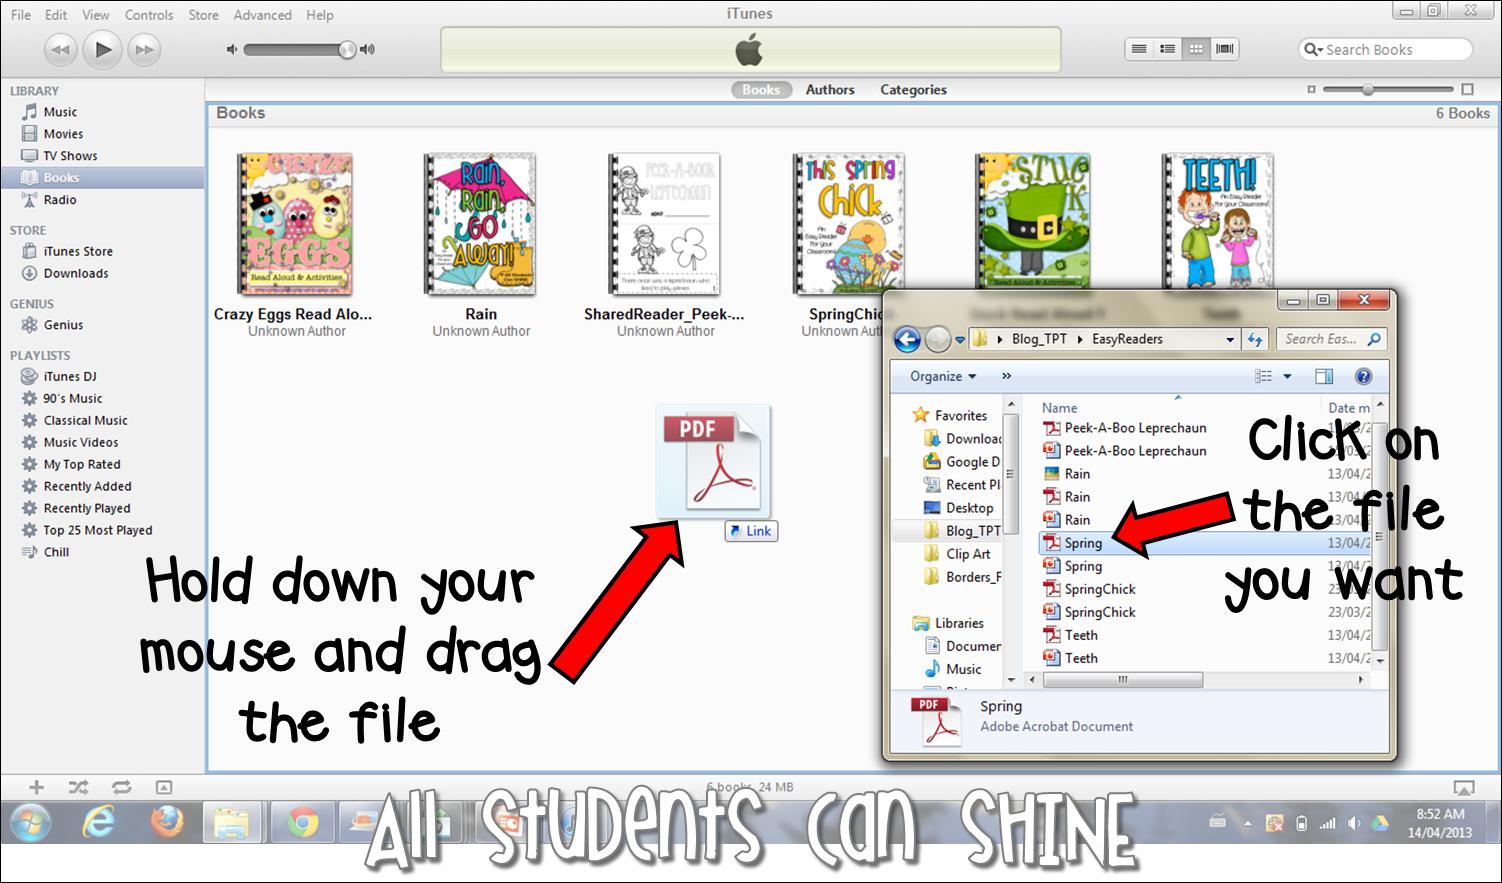 how to pdf file on my ipad